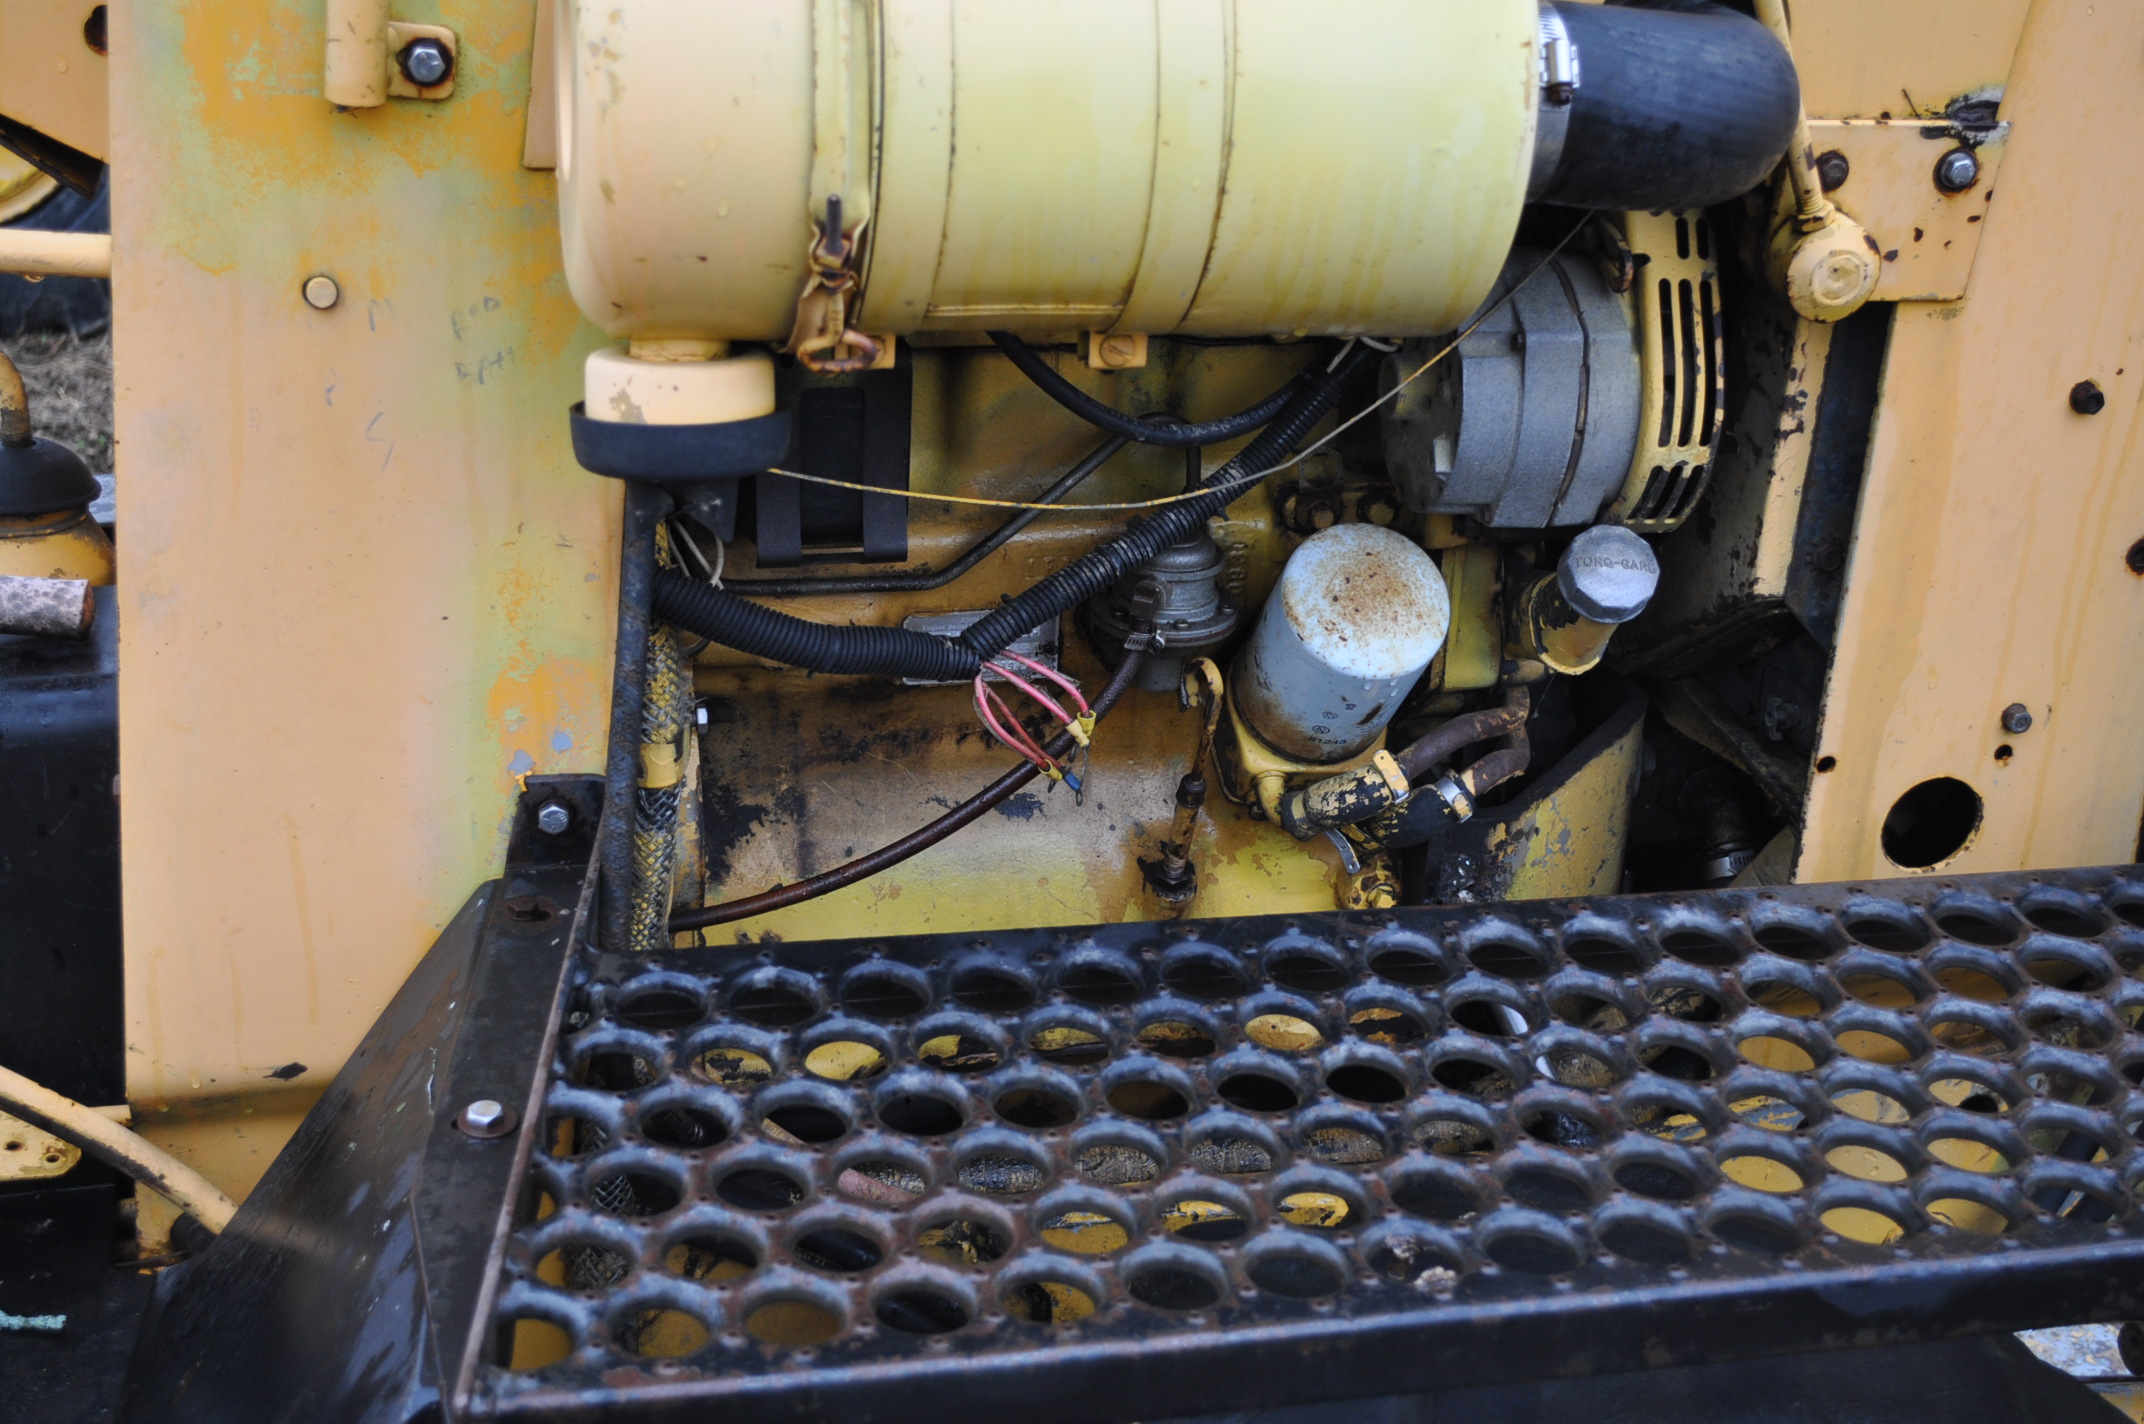 Vermeer V450 Trencher, parts machine, backhoe attachment, JD diesel, SN 1VRF082L2H1000460 - Image 11 of 15